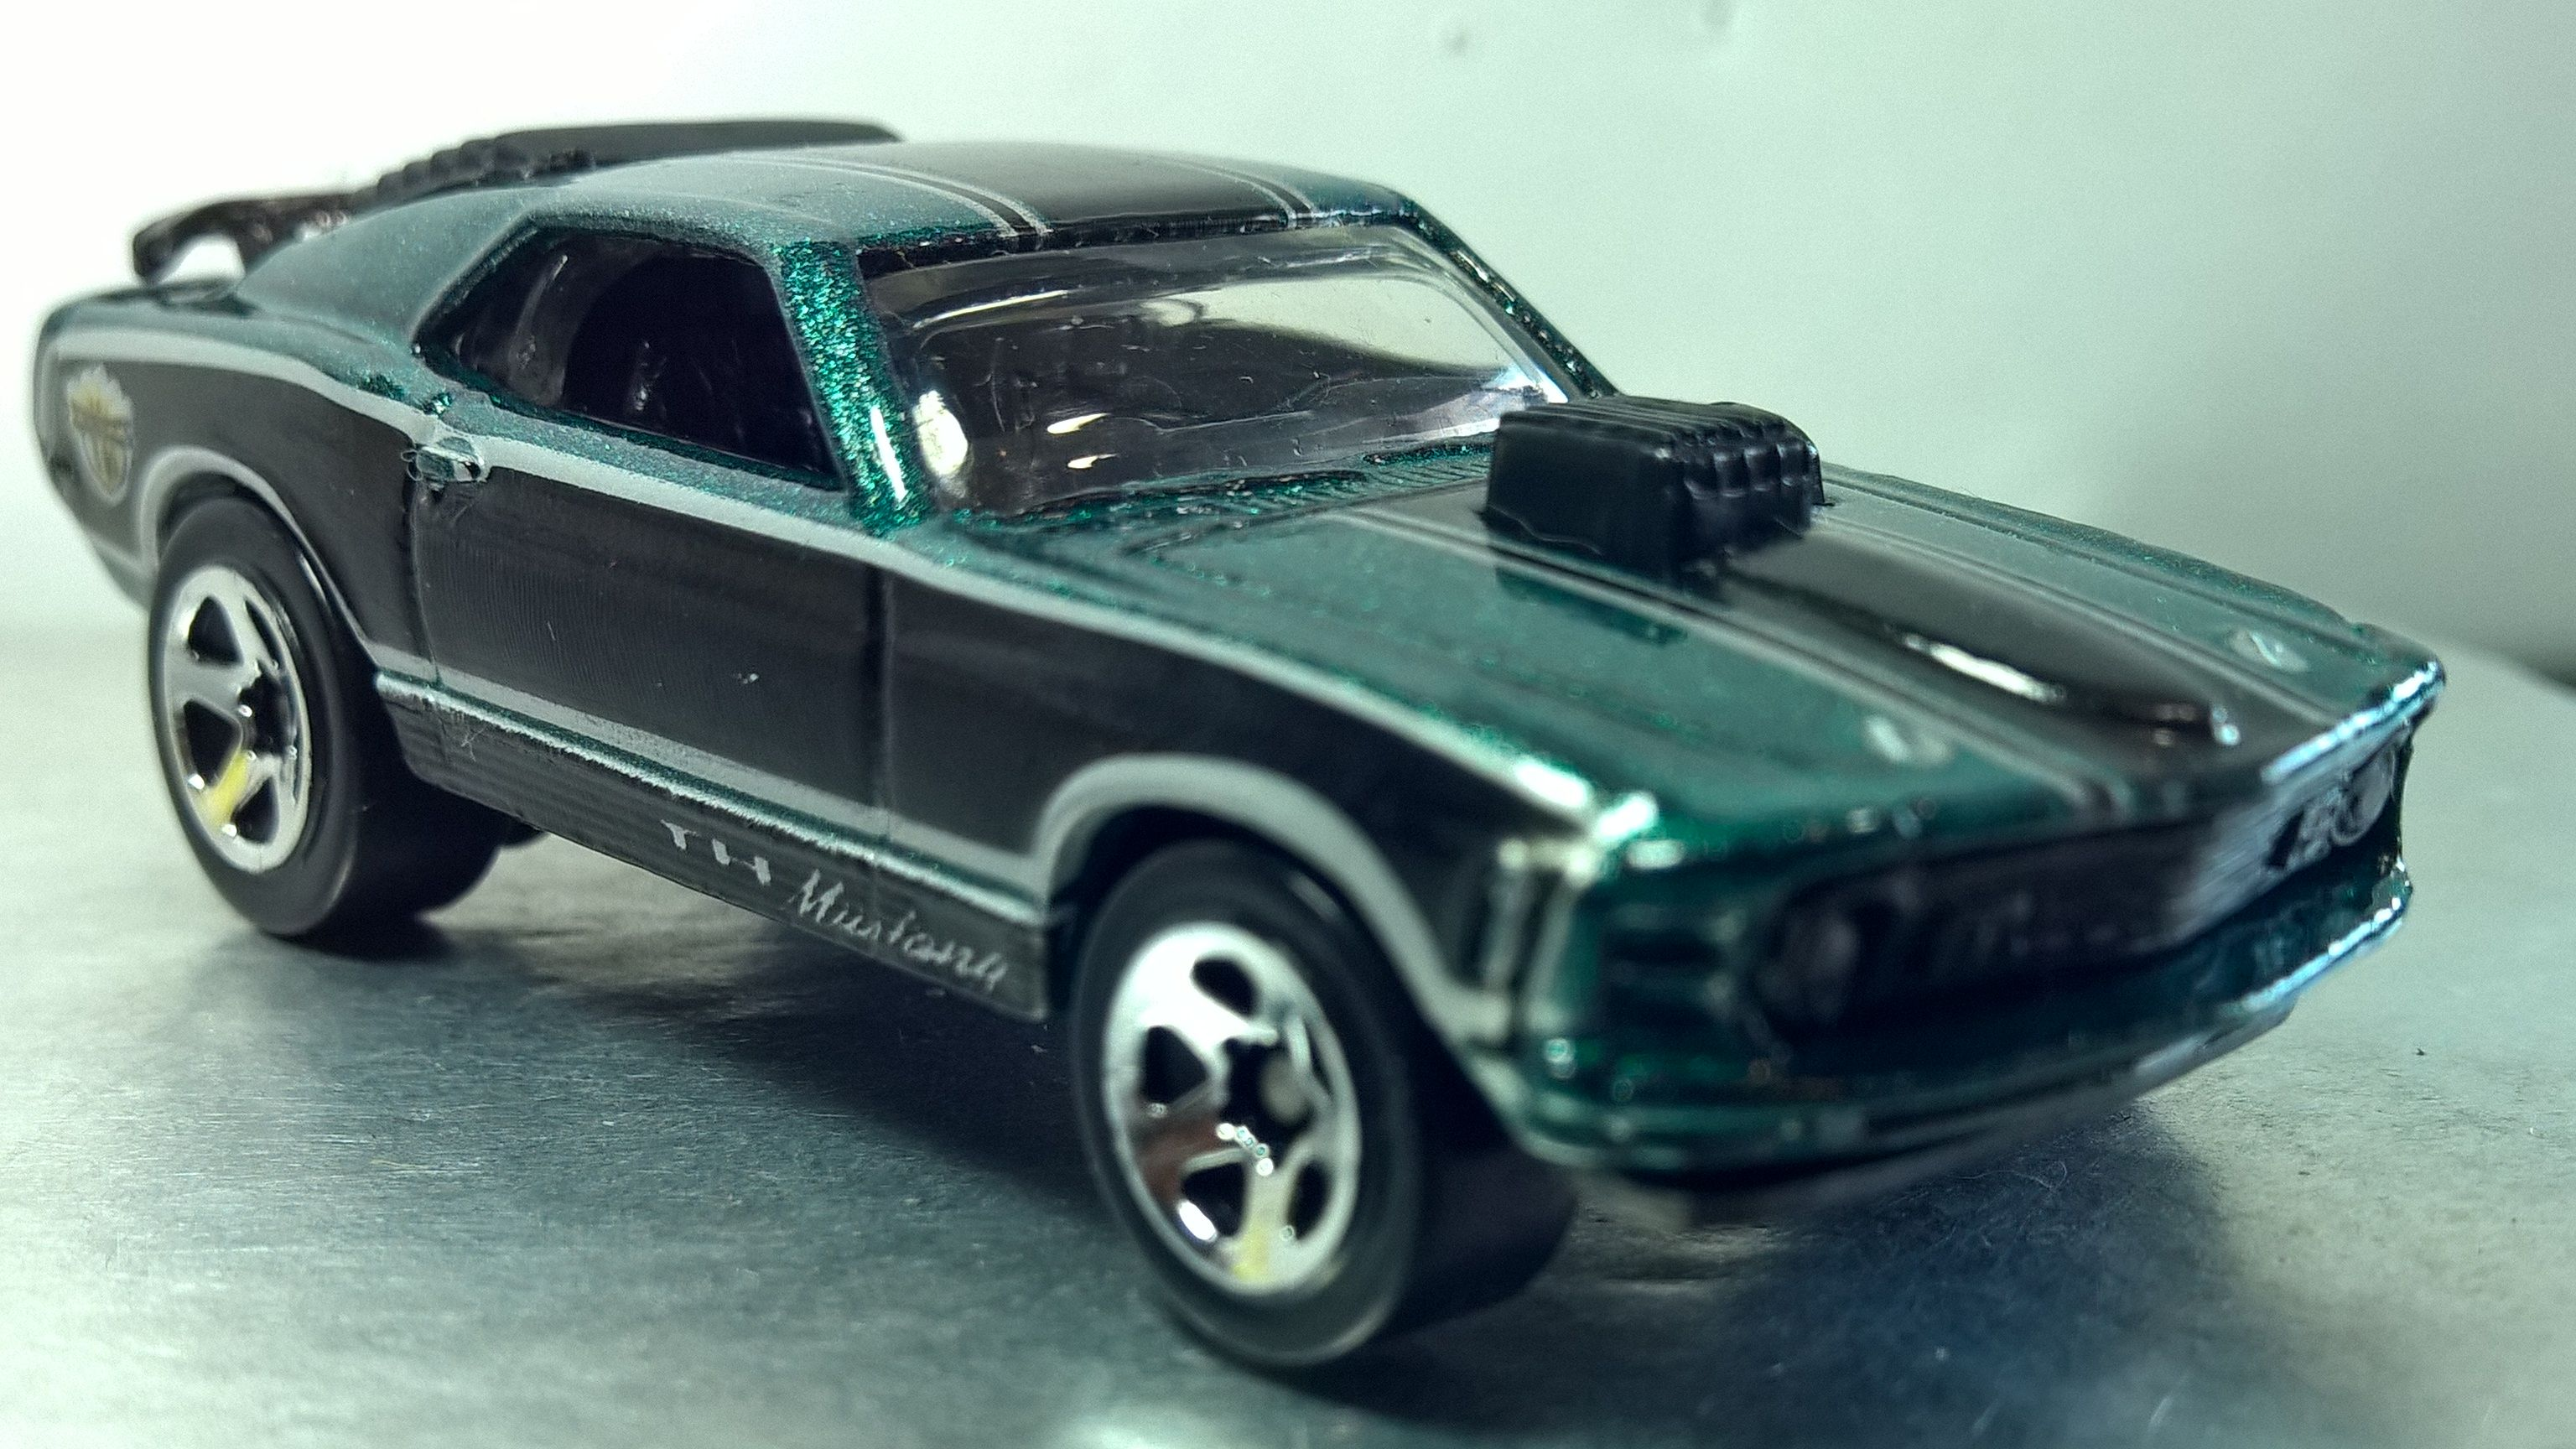 Hot Wheels 70 Ford Mustang Mach I Treasure Hunt Collector 939